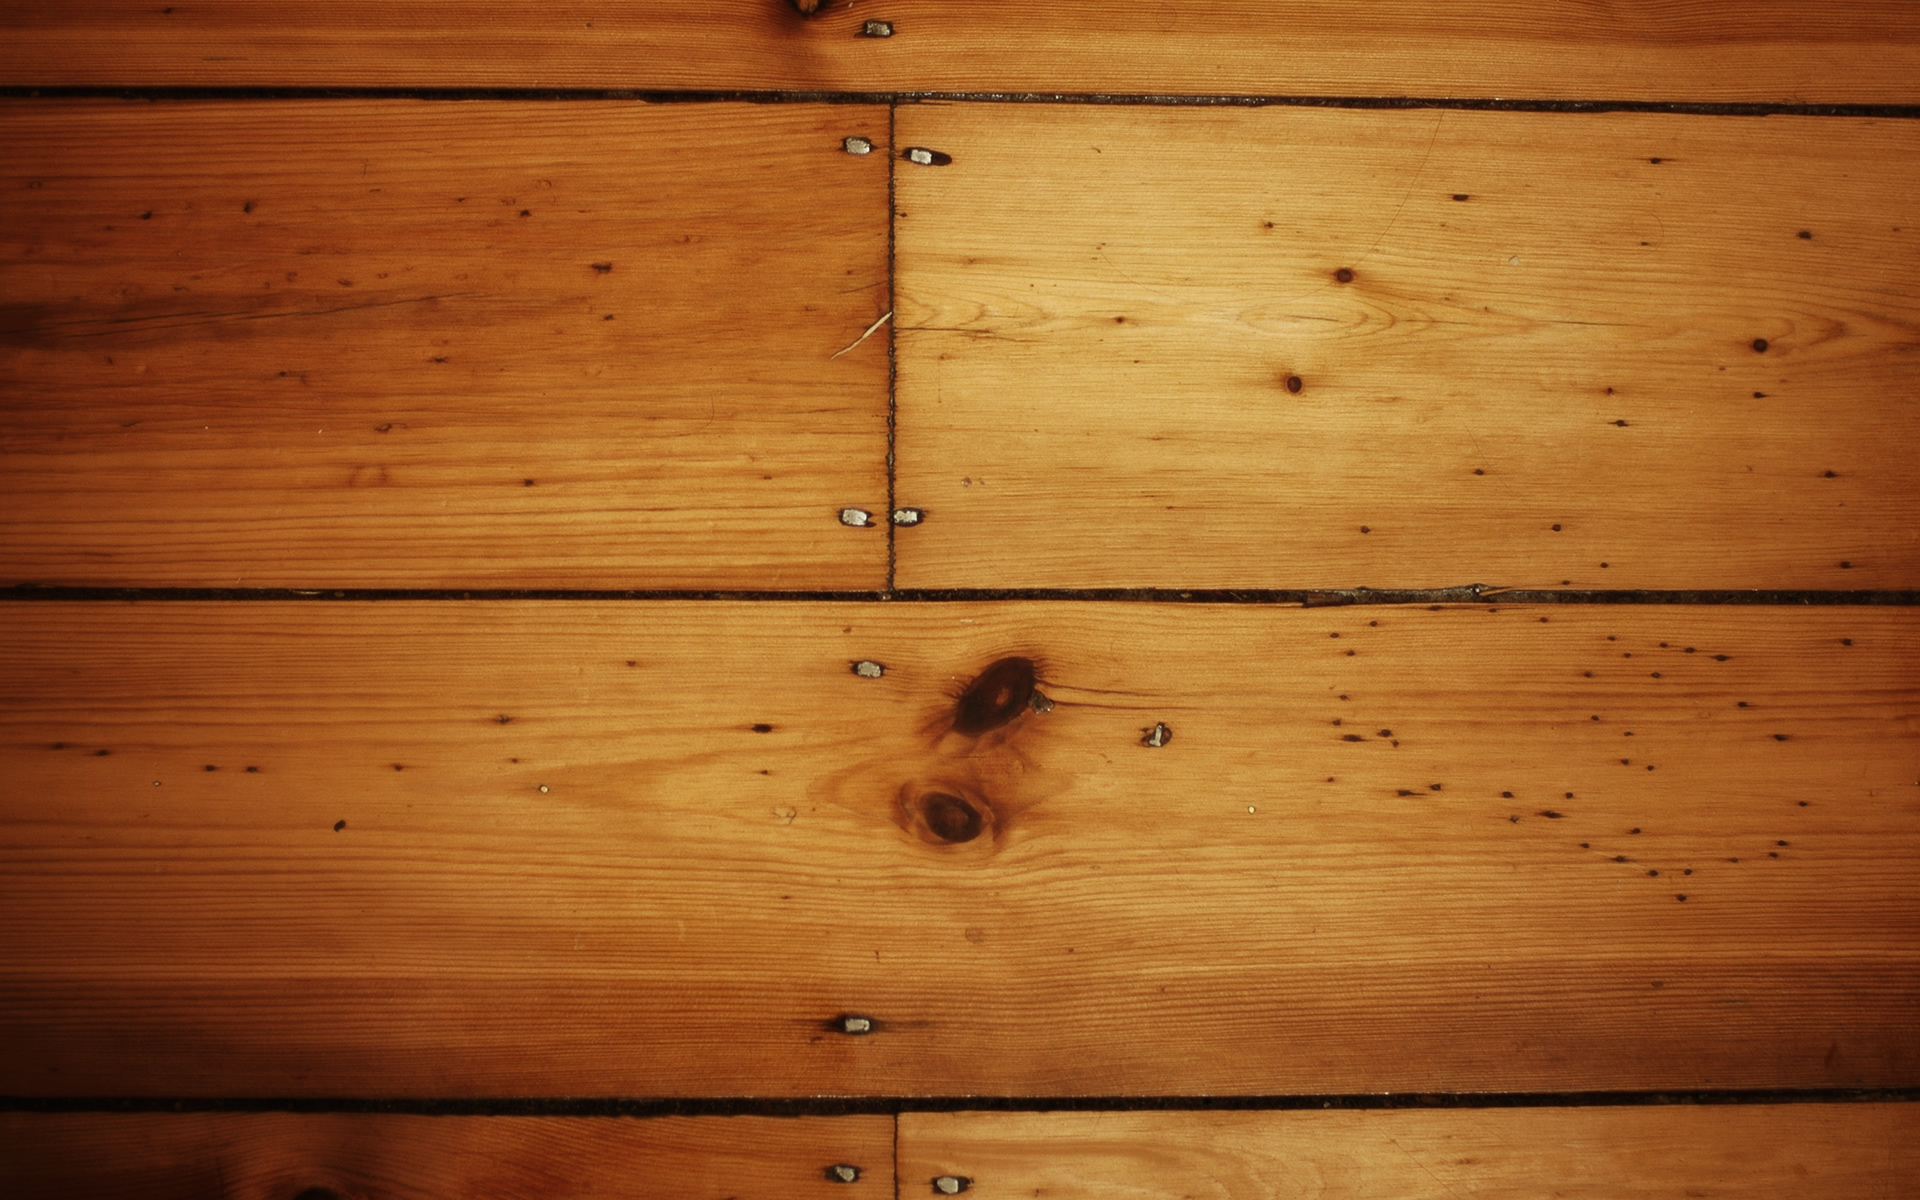 Hd Wooden Wallpaper - wallpaper hd